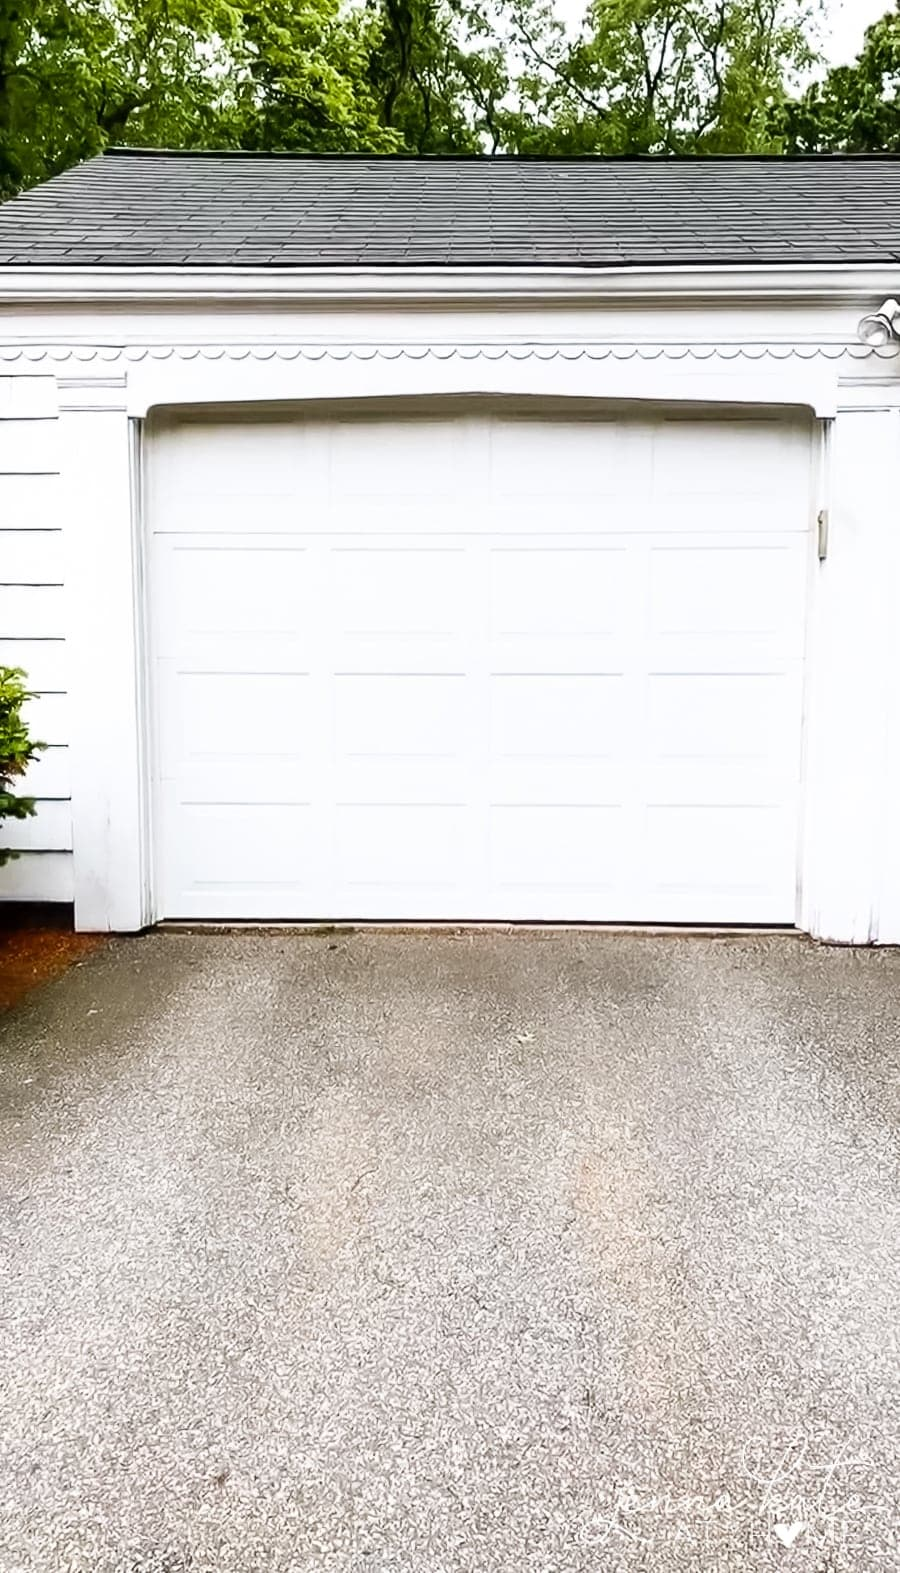 Plain garage doors before makeover